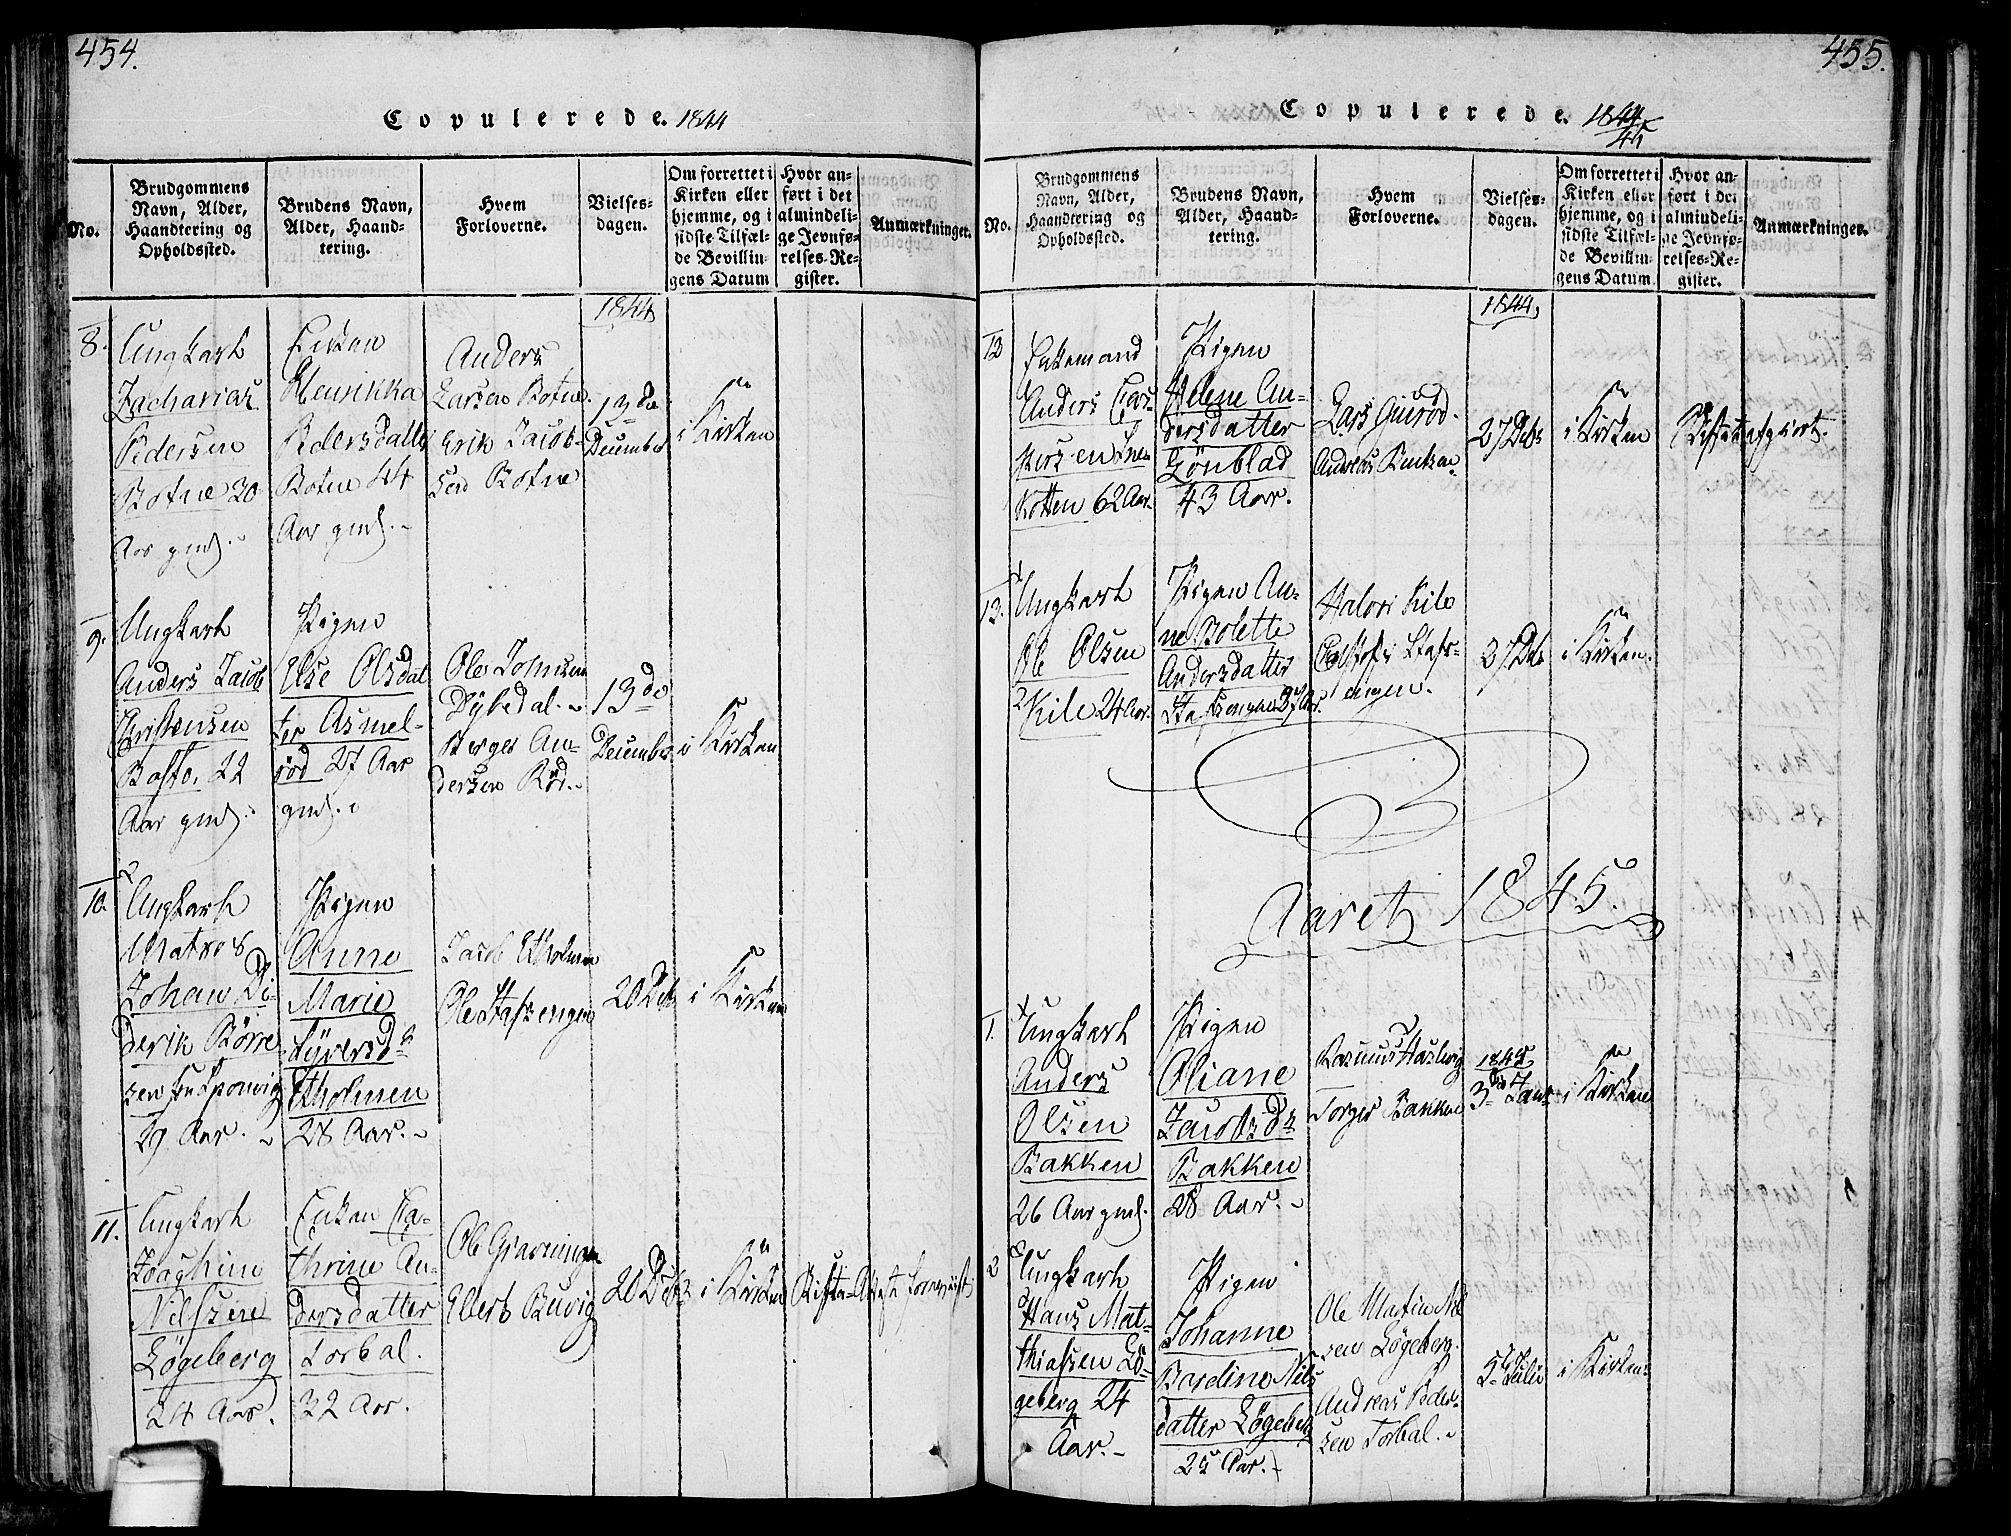 SAO, Hvaler prestekontor Kirkebøker, F/Fa/L0005: Ministerialbok nr. I 5, 1816-1845, s. 454-455